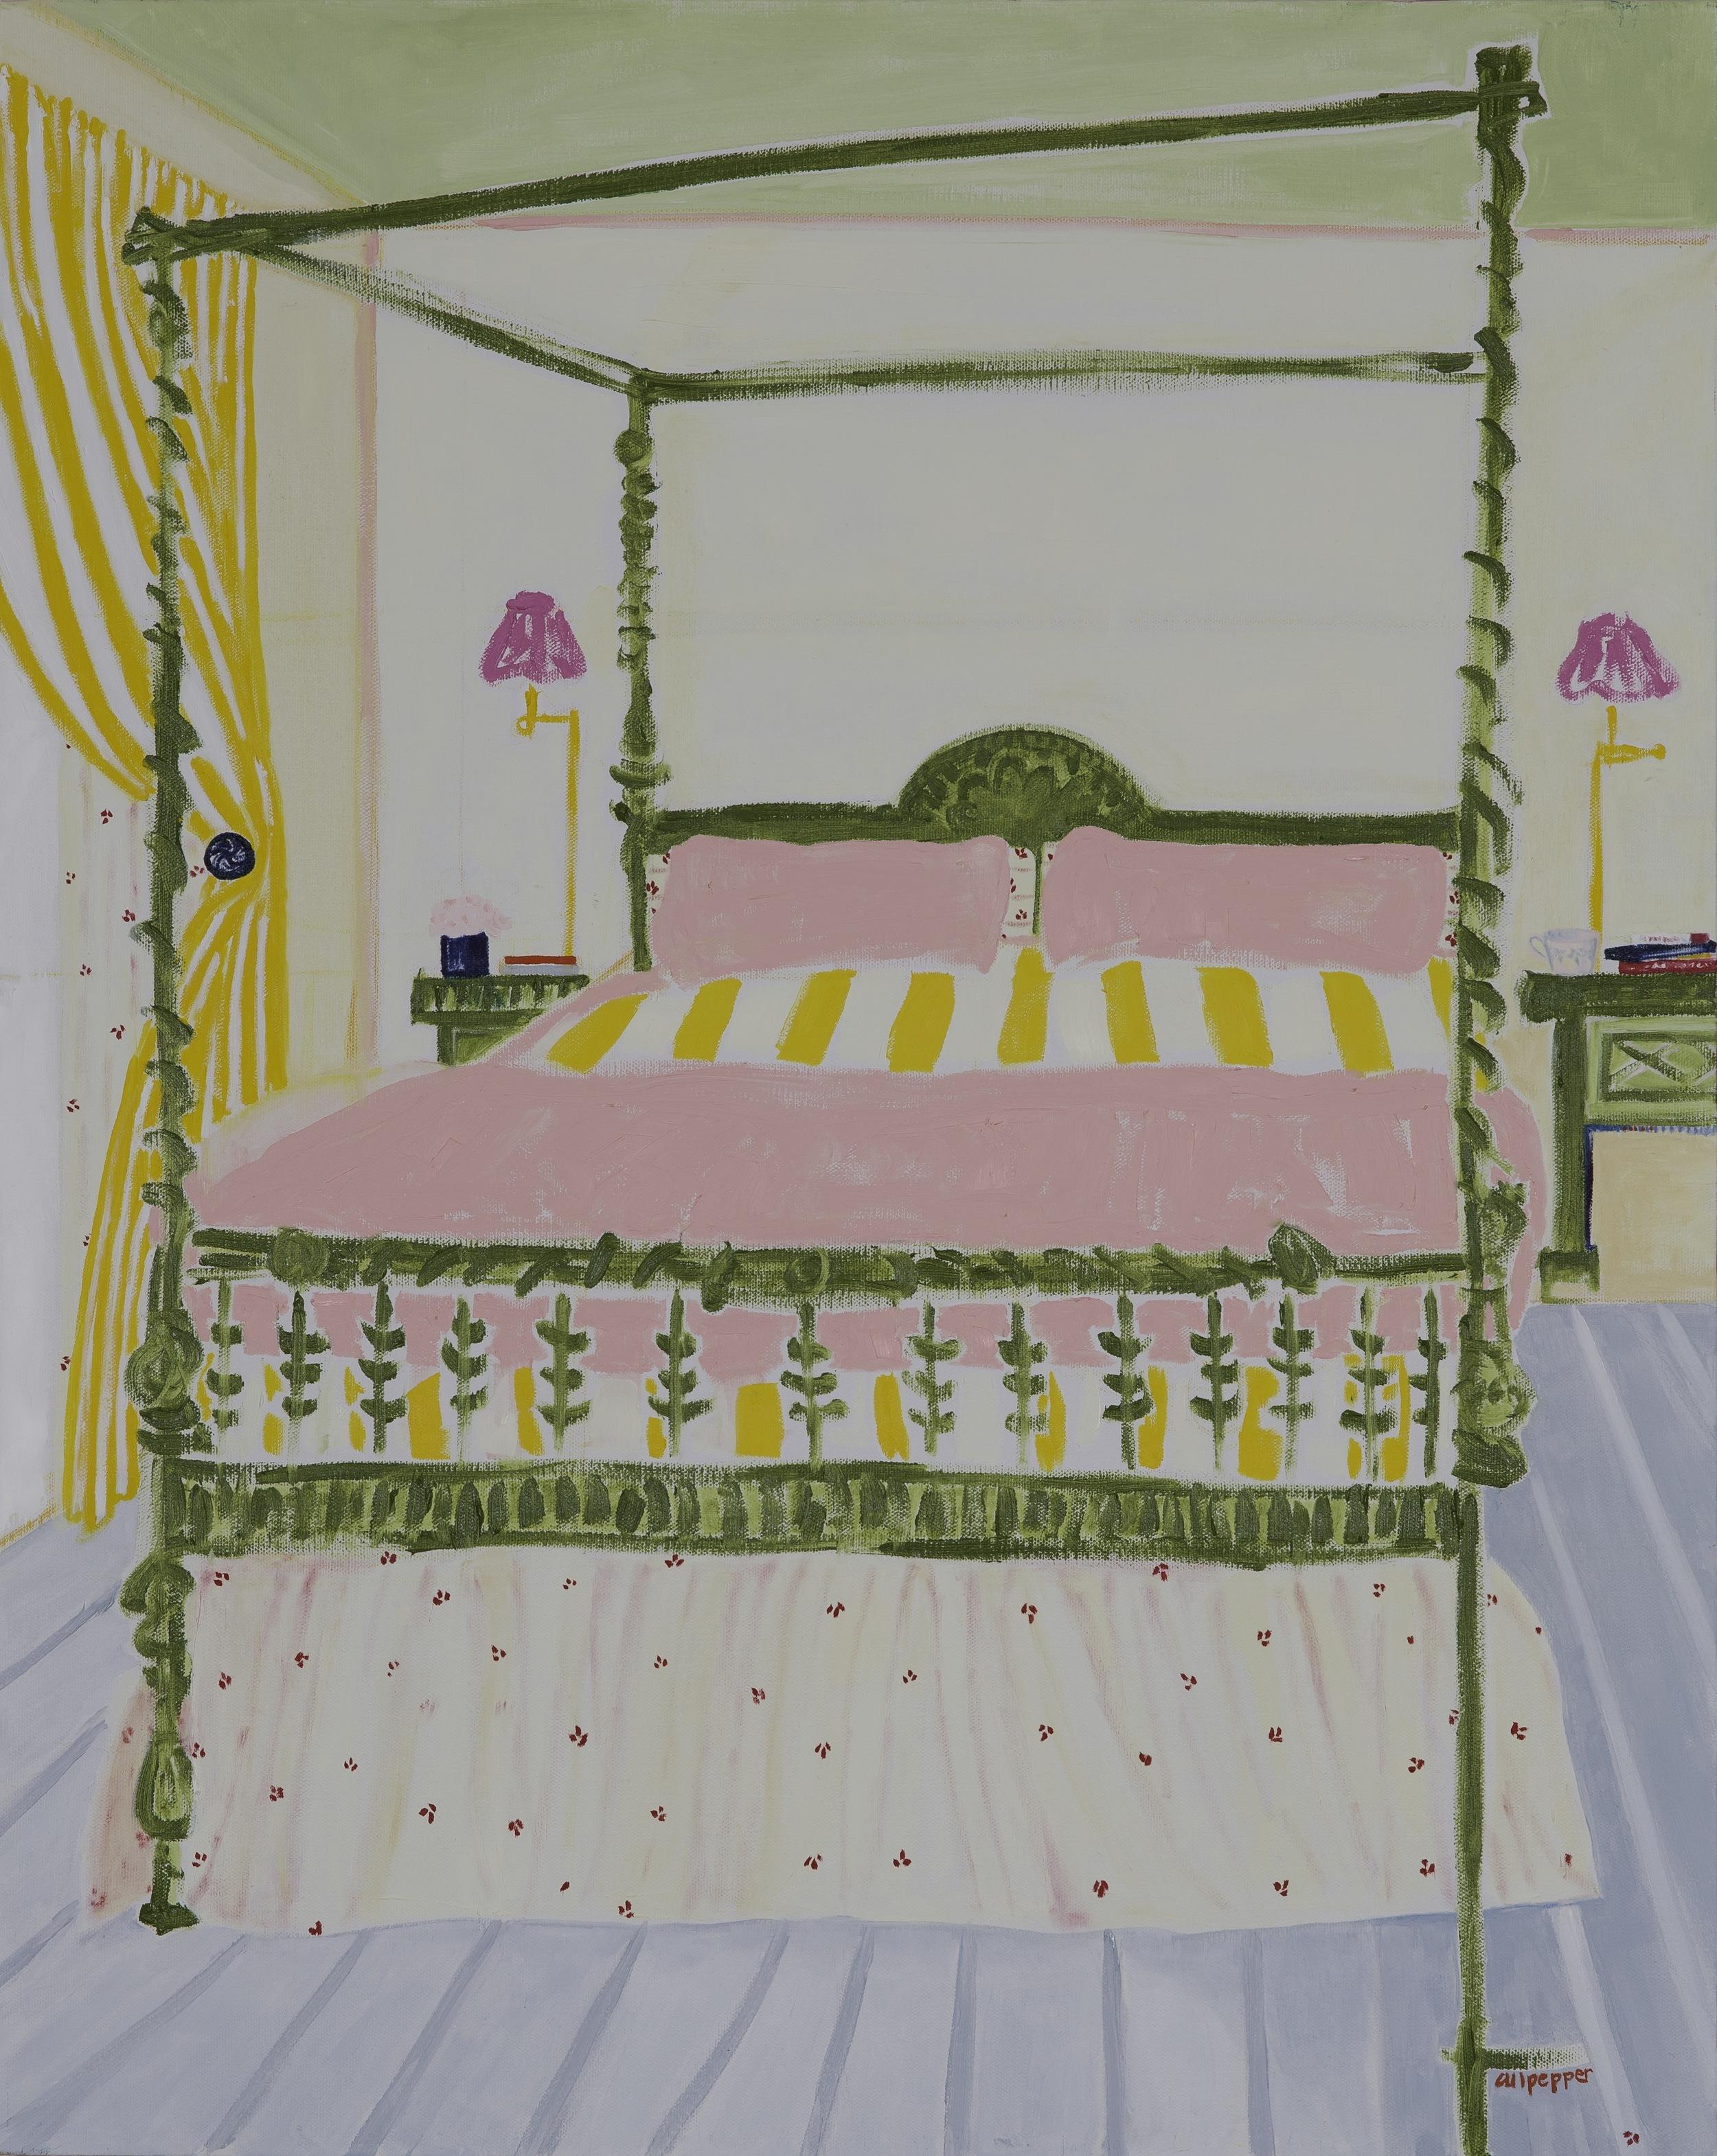 e.m. gordan's bed